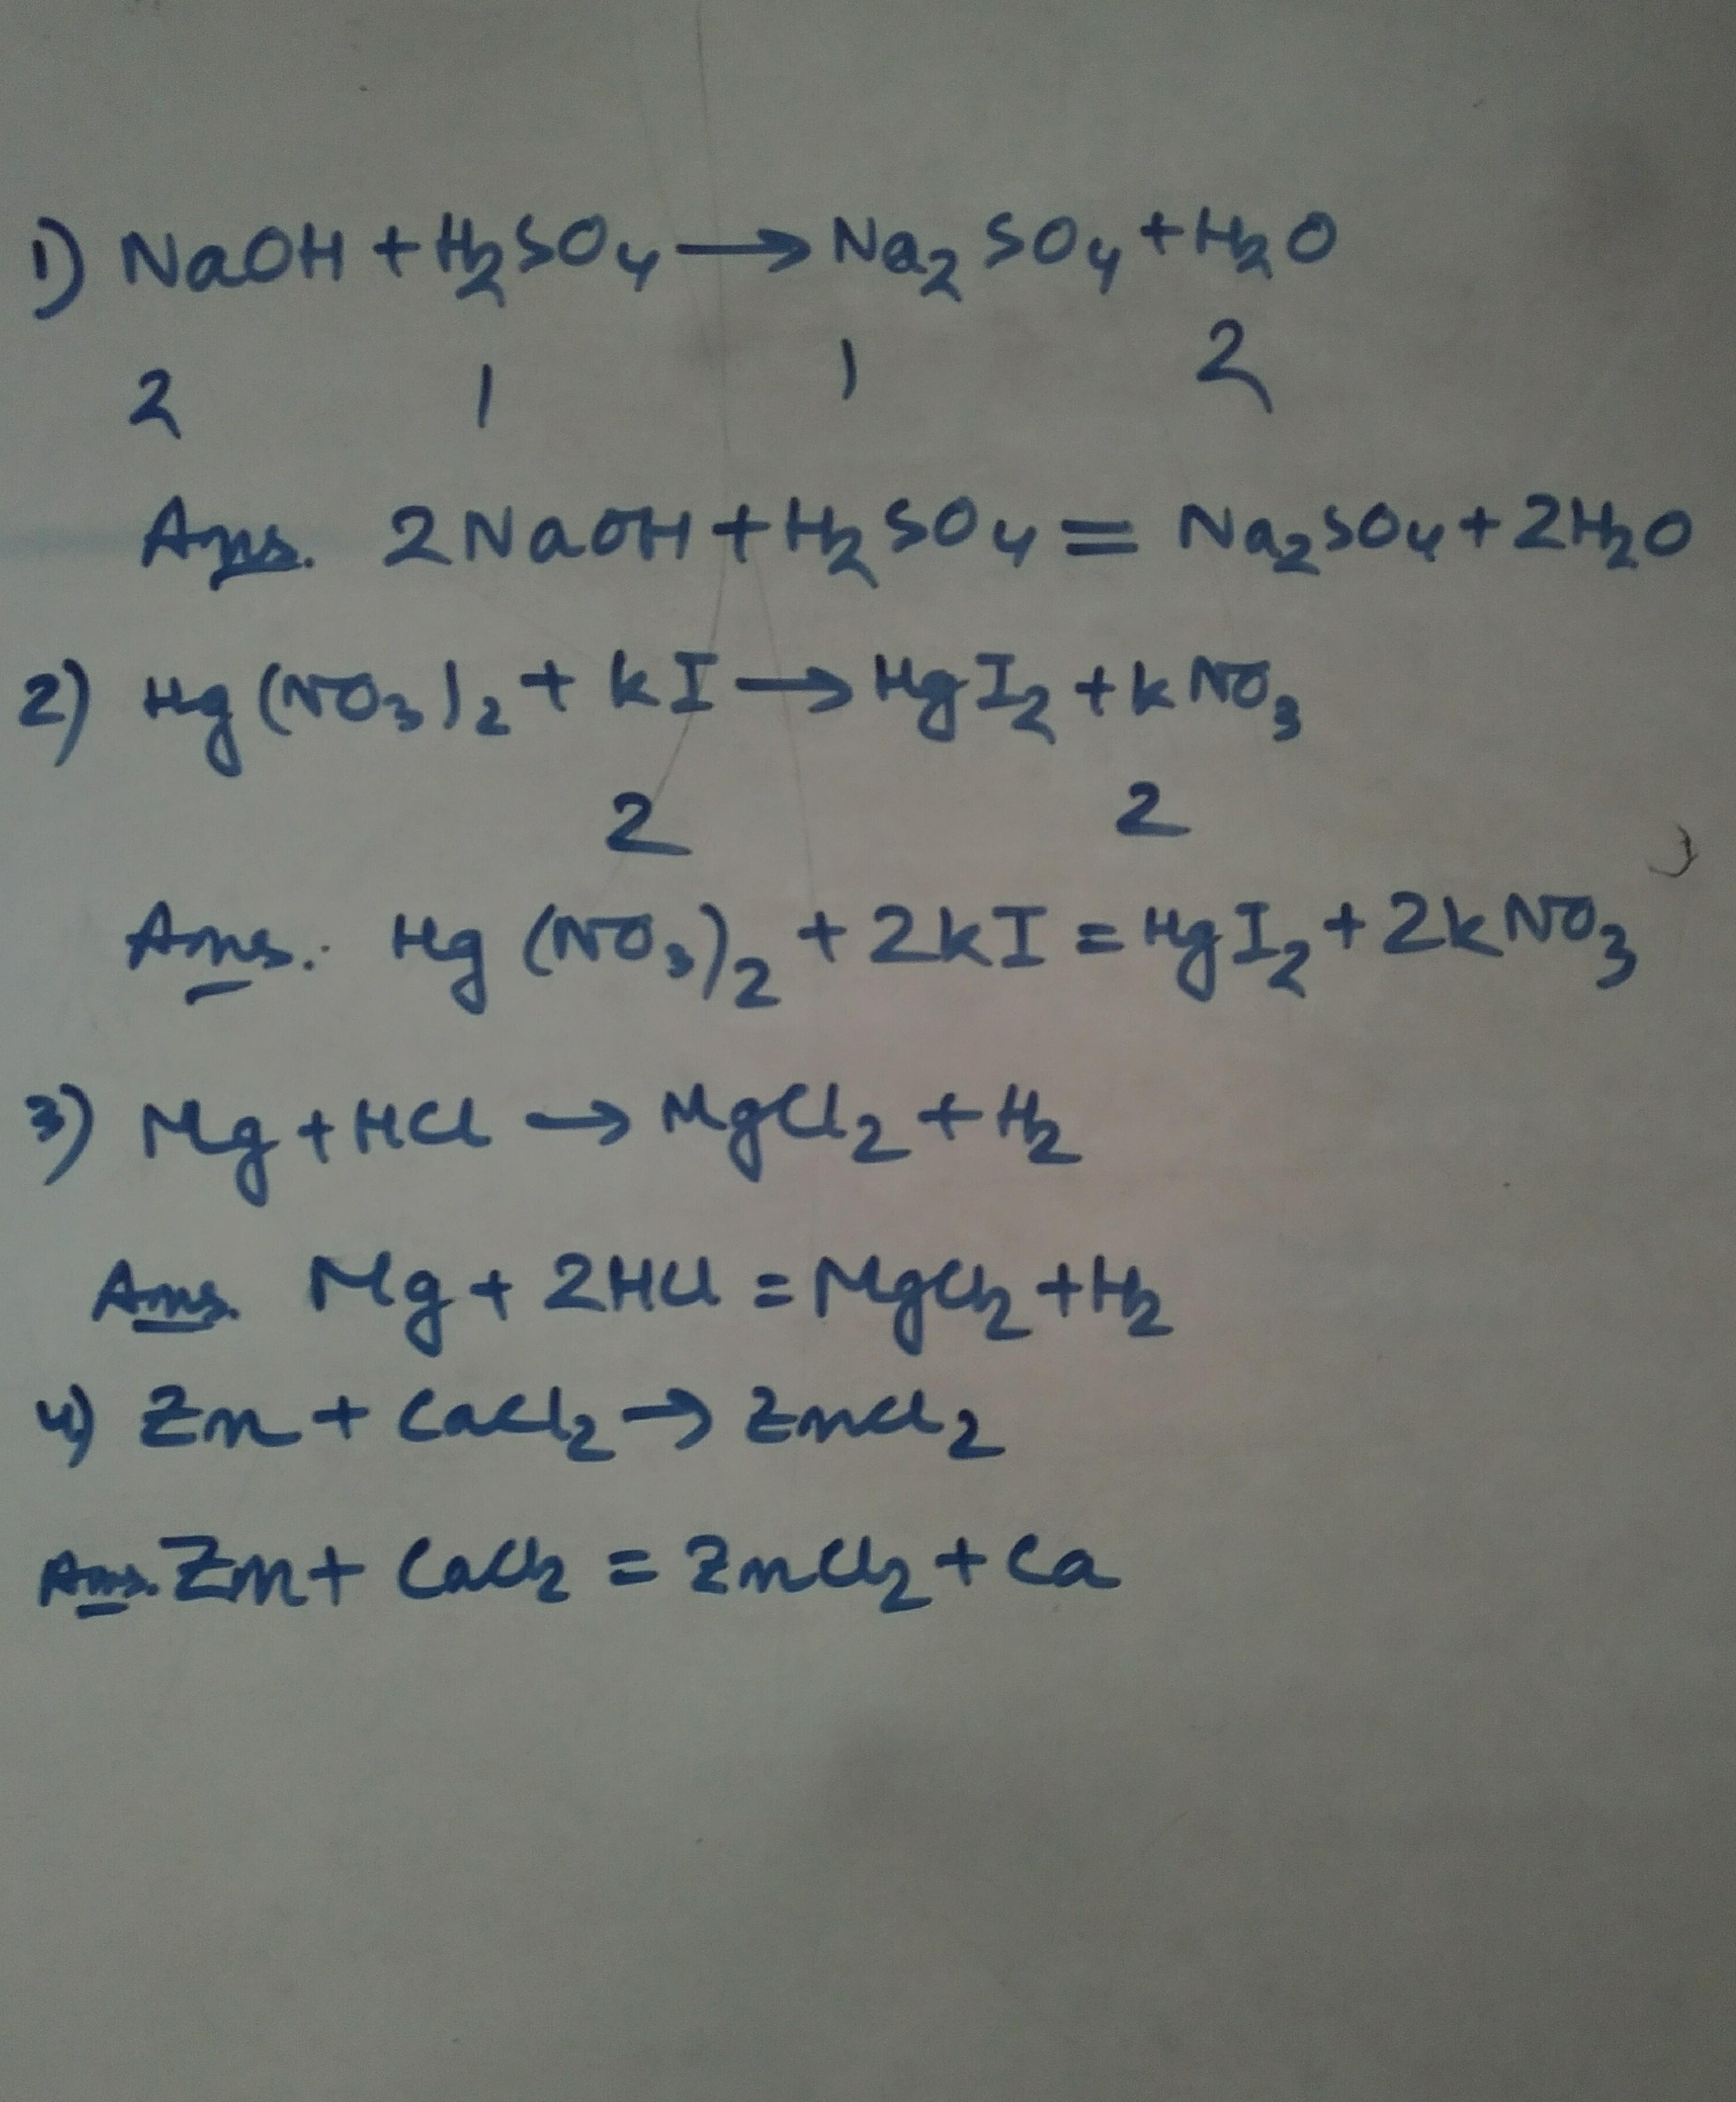 Naoh H2so4 : h2so4, Balance, Following, Chemical, Equation?, NaoH+H2So4---------Na2so4+H2o., Brainly.in